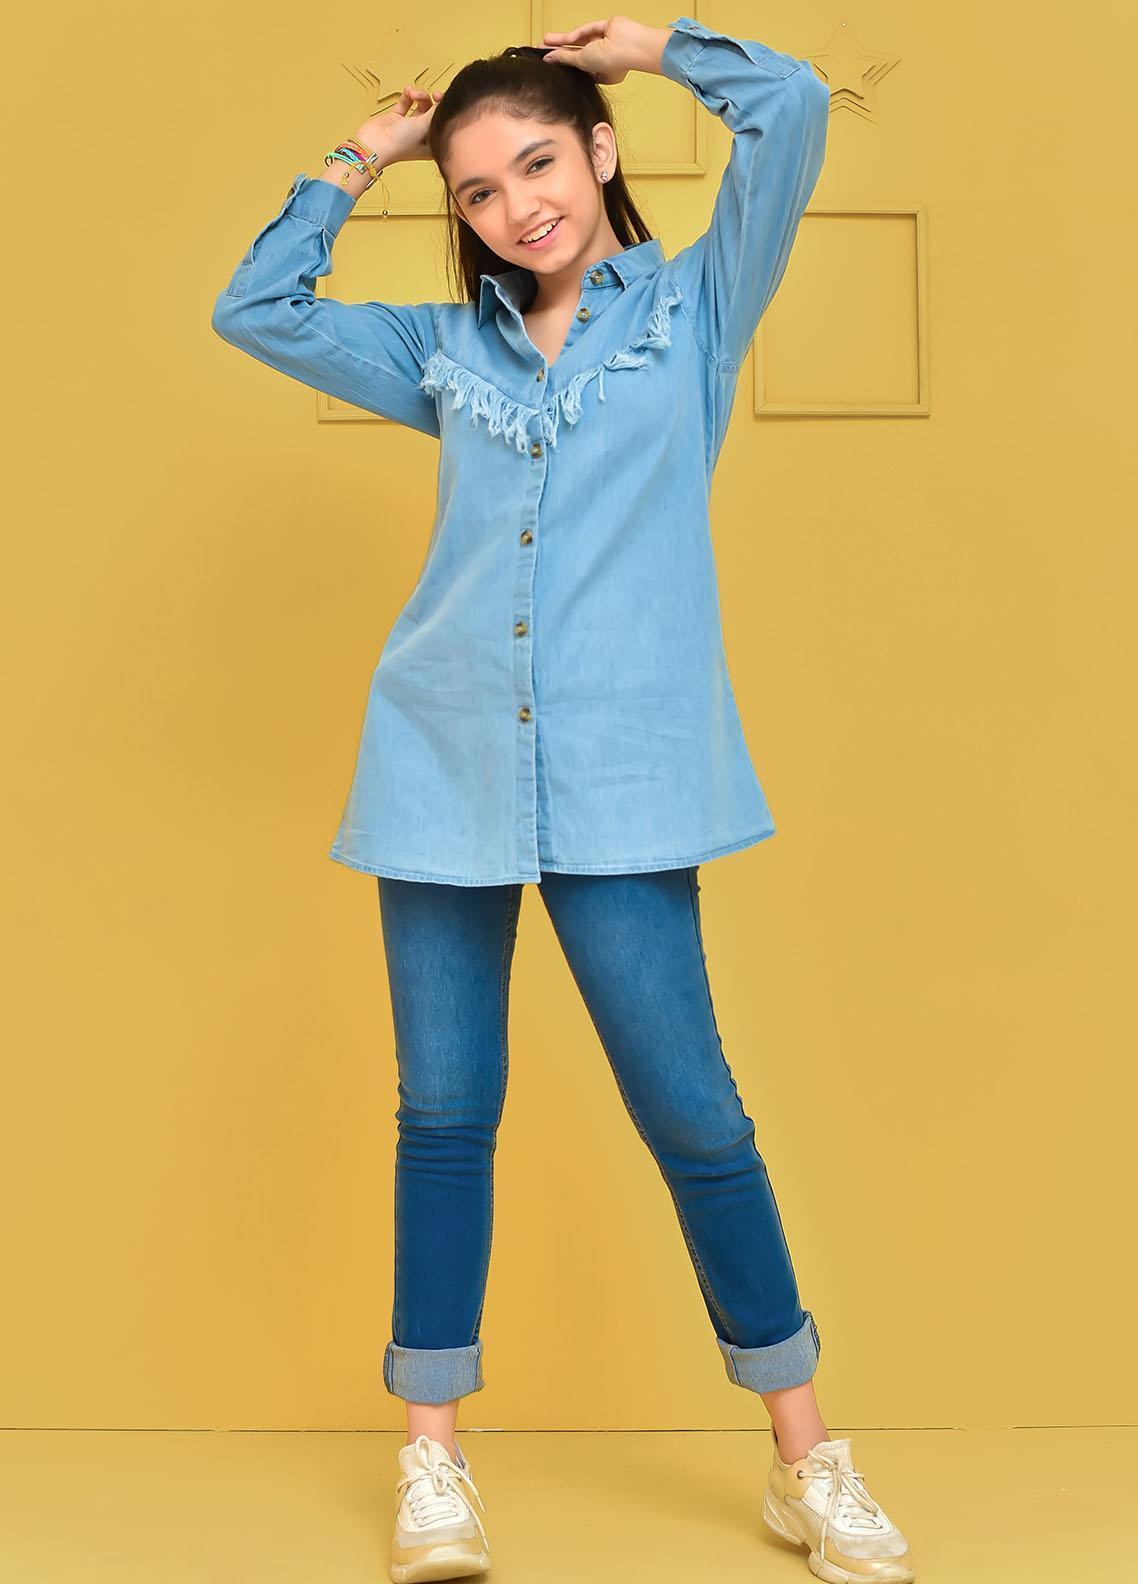 Ochre Cotton Western Top for Girls -  OWT-454 Blue